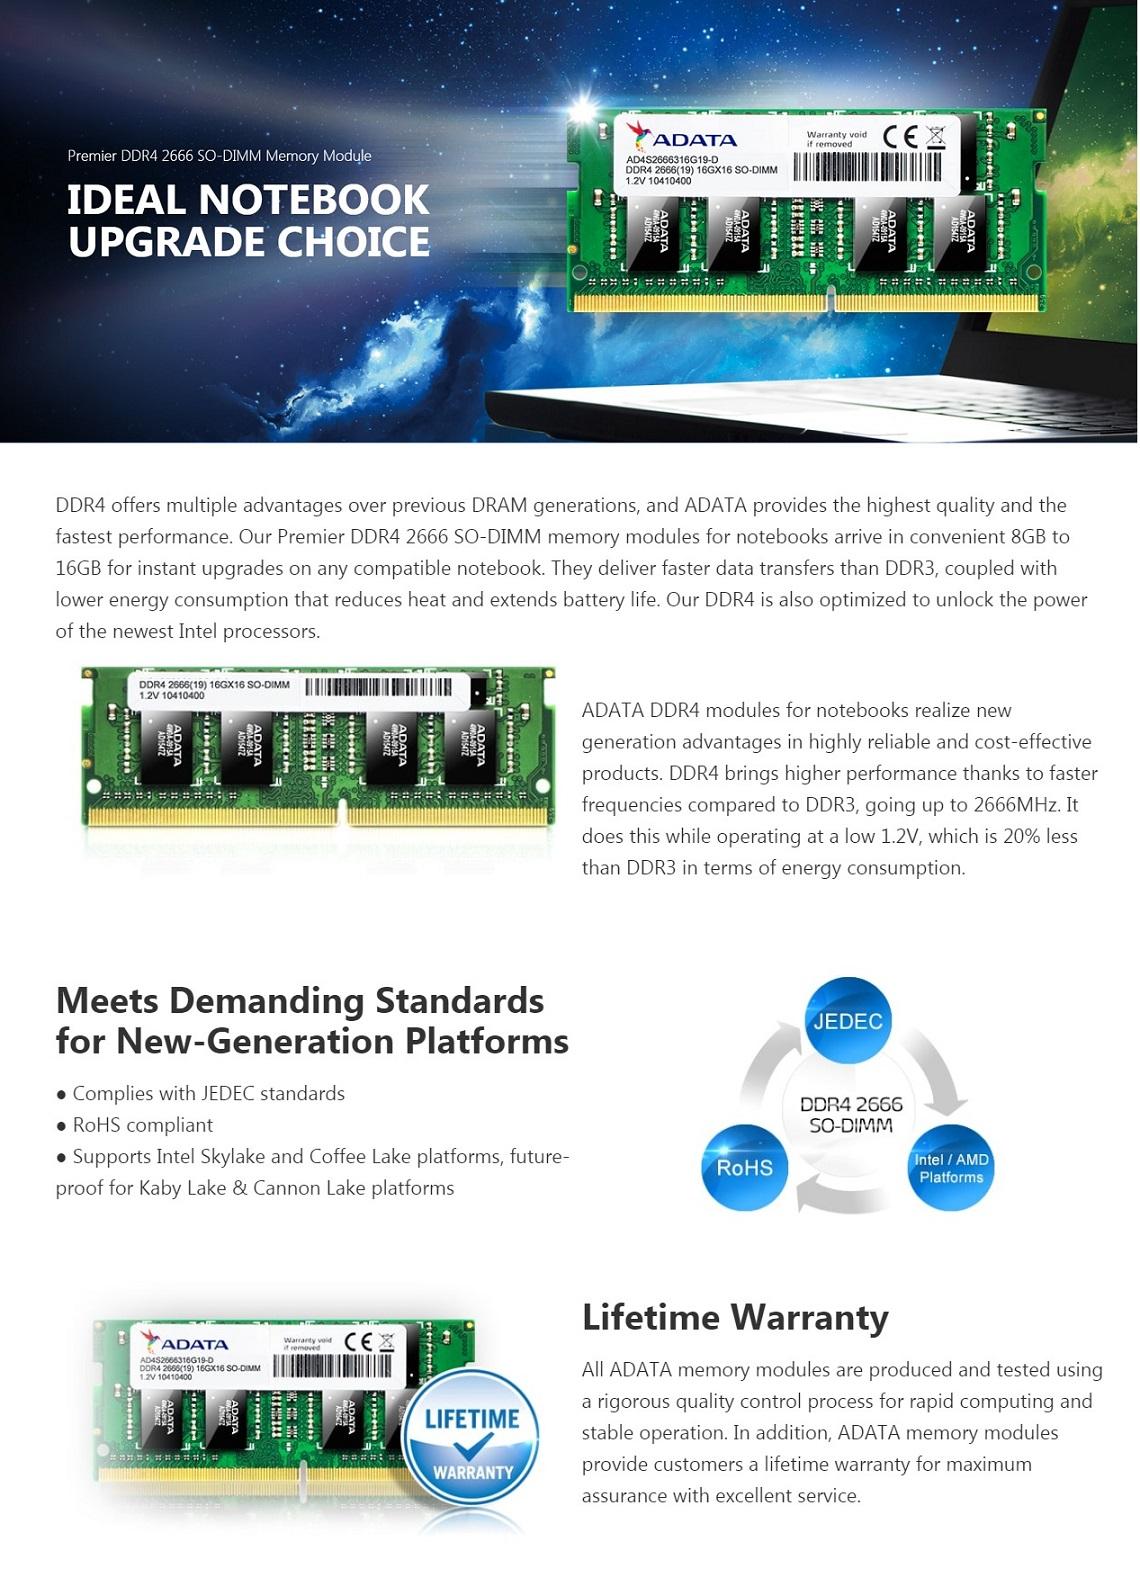 Adata 8GB Premier DDR4 2666Mhz 1.2v 260-pin SO-DIMM Memory Module Laptop Memory